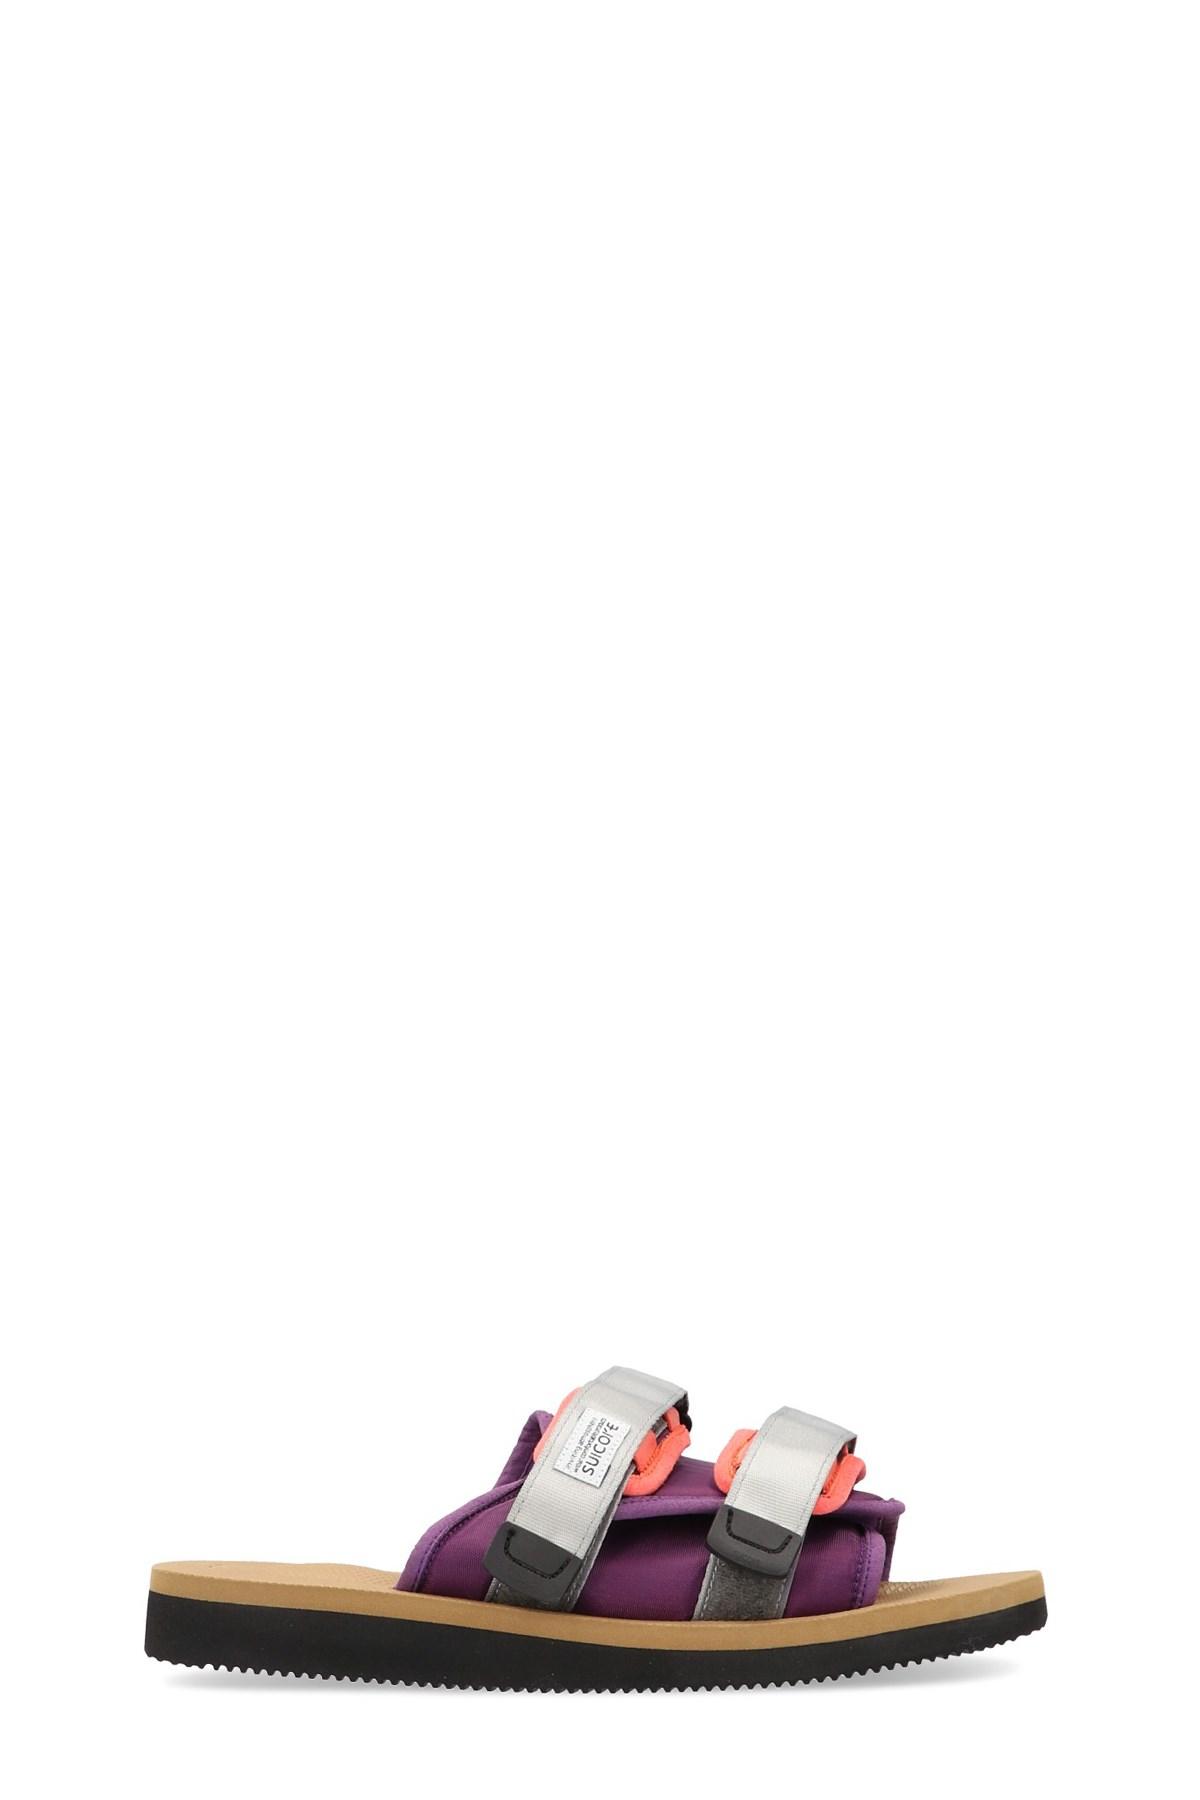 56e5d2b45 suicoke 'Moto' slides available on julian-fashion.com - 67346